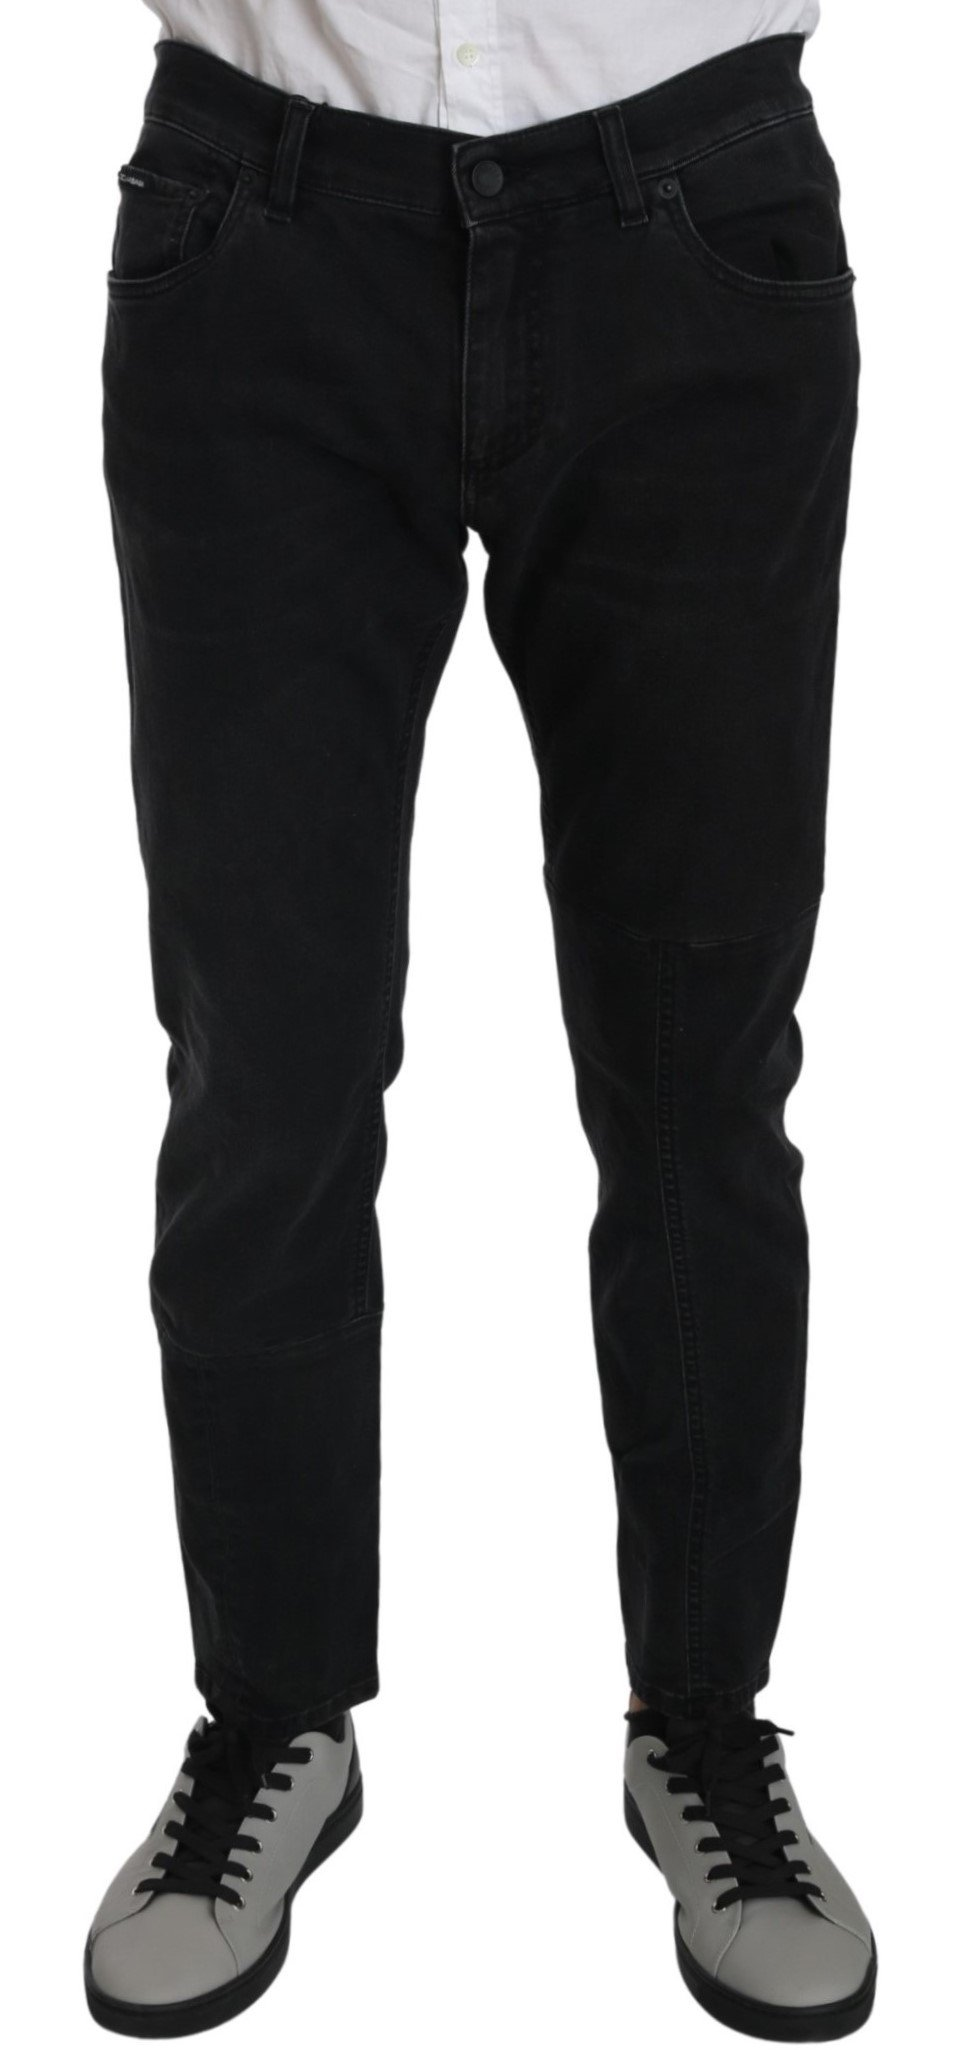 Dolce & Gabbana Men's Cotton Stretch Skinny Slim Fit Jeans Black PAN70882 - IT50 | L